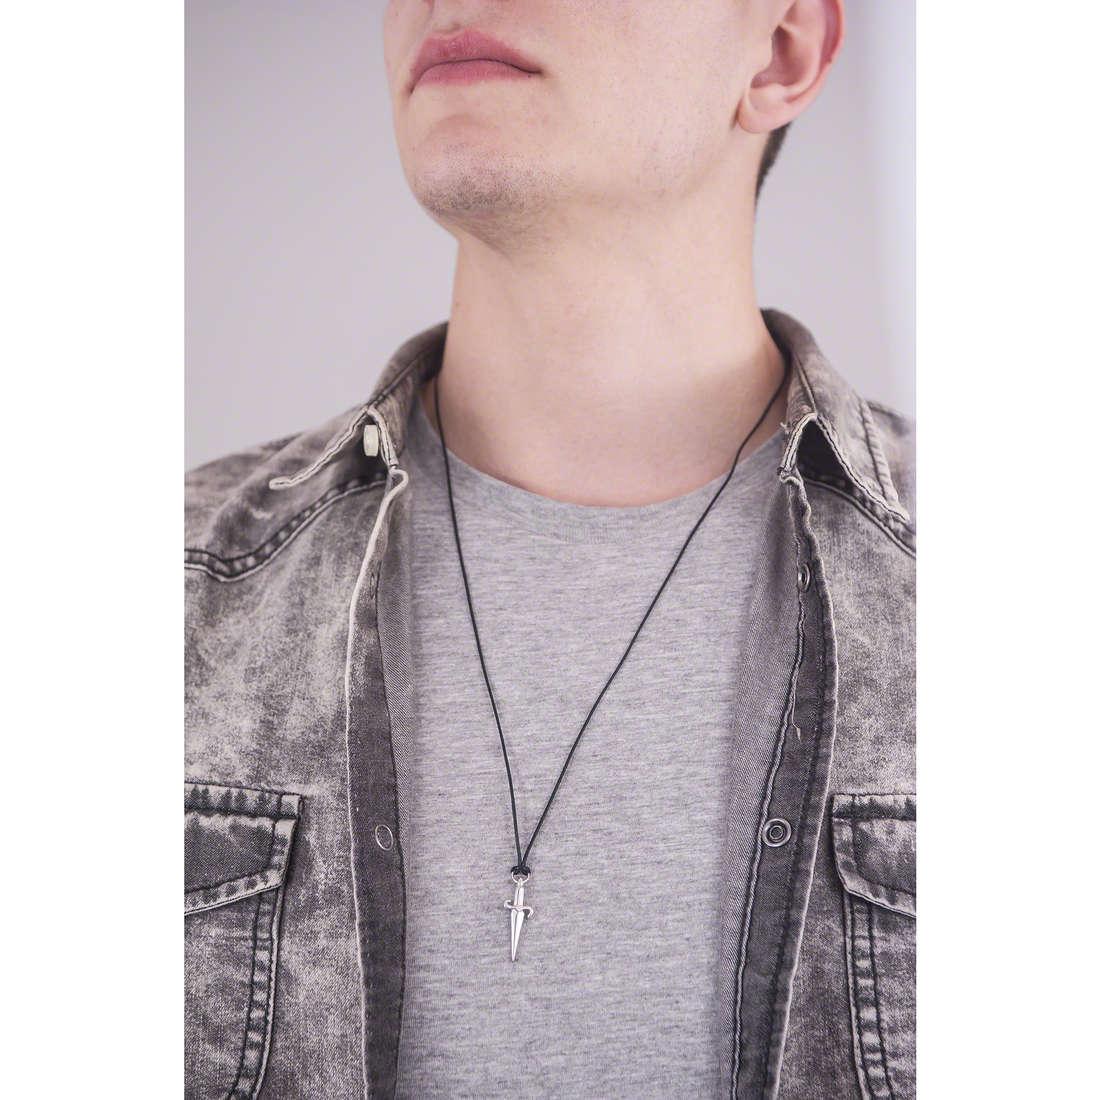 Cesare Paciotti necklaces man JPCL0053B indosso